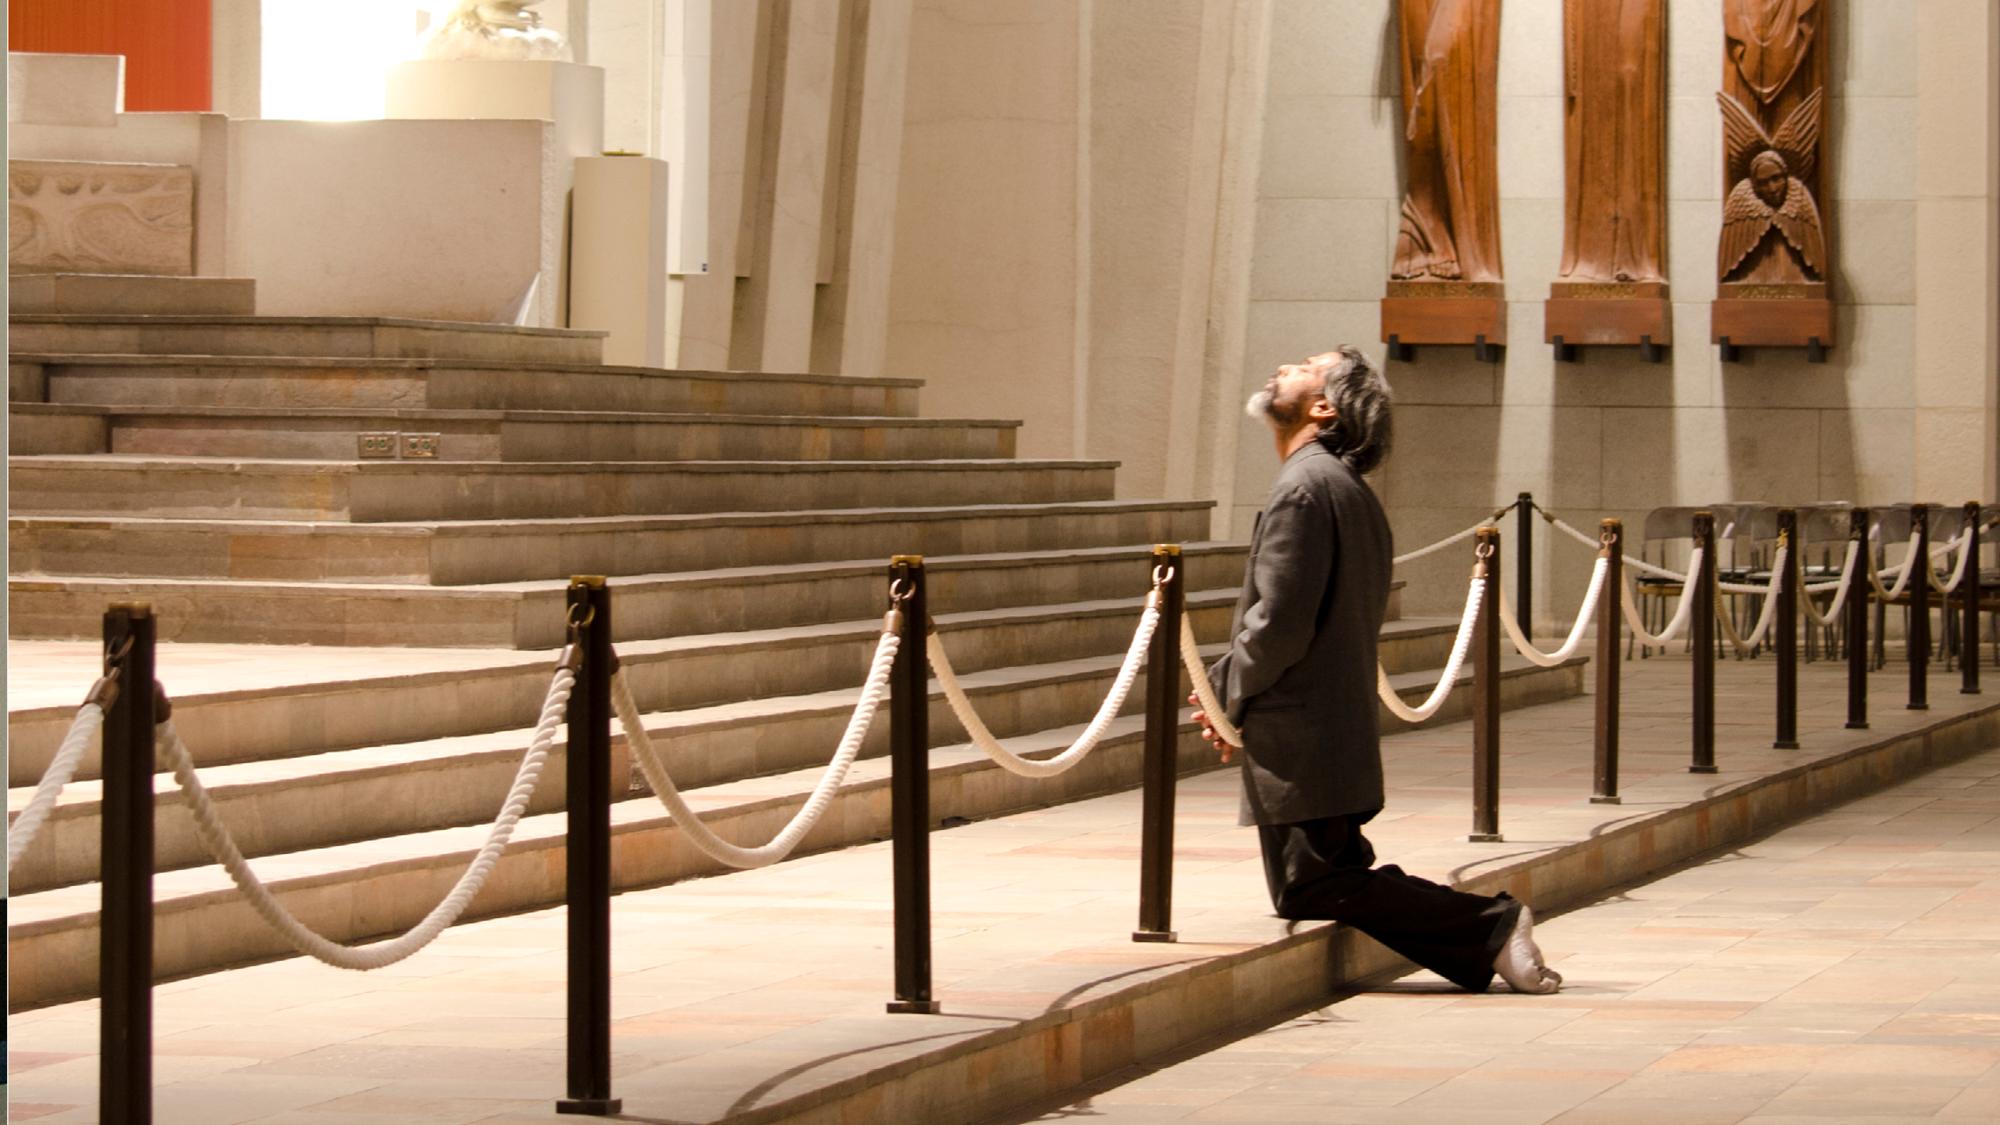 """The People's Testimony Of Faith Stimulates My Faith And Hope."""